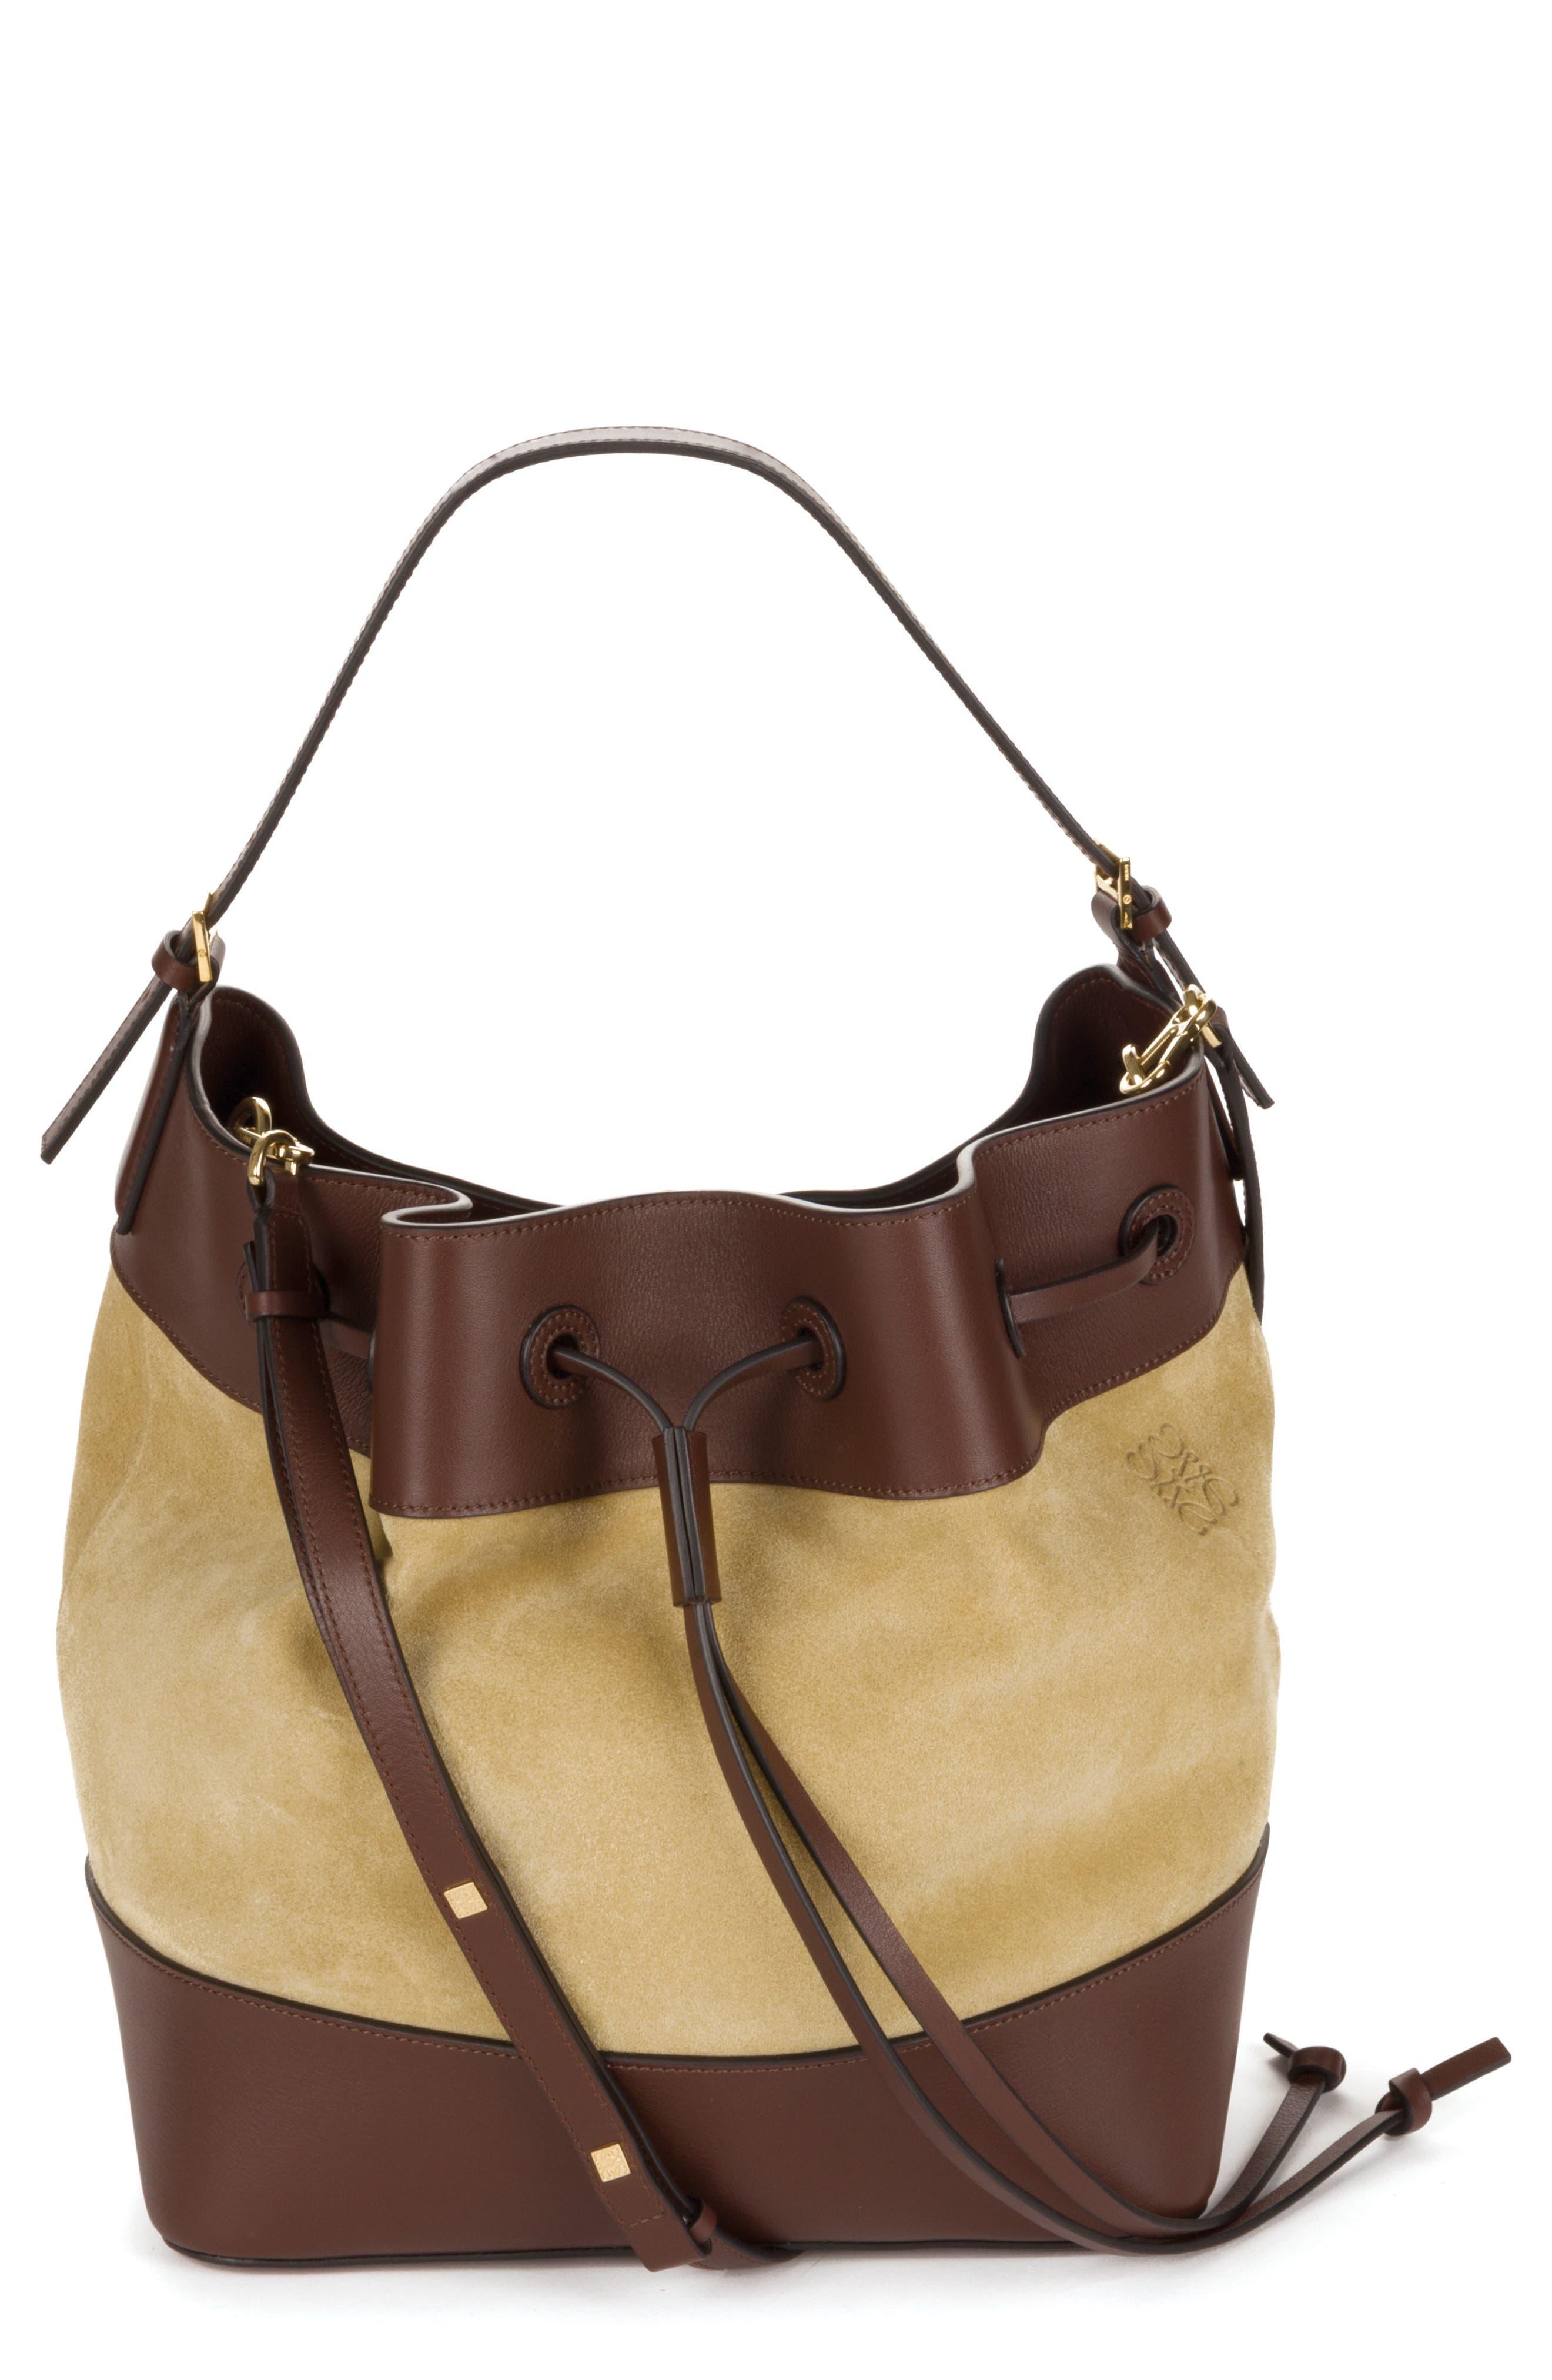 LOEWE Midnight Leather & Suede Bucket Bag